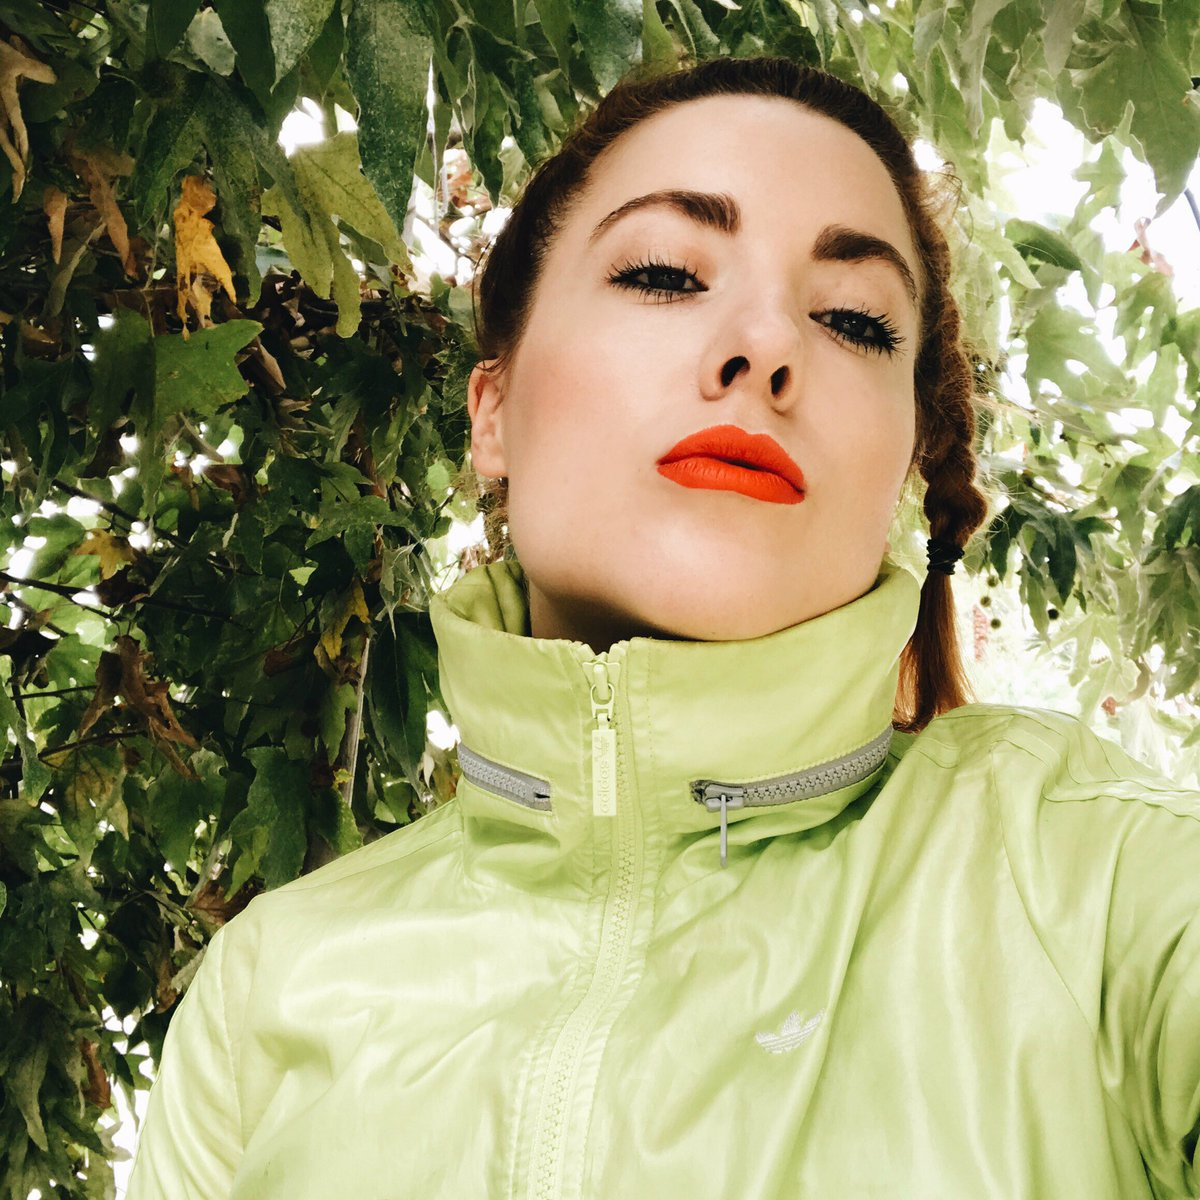 Sarah Payne (actress),Maia Cotton NZL 2018 Sex gallery Anna Hruby,Arkie Whiteley